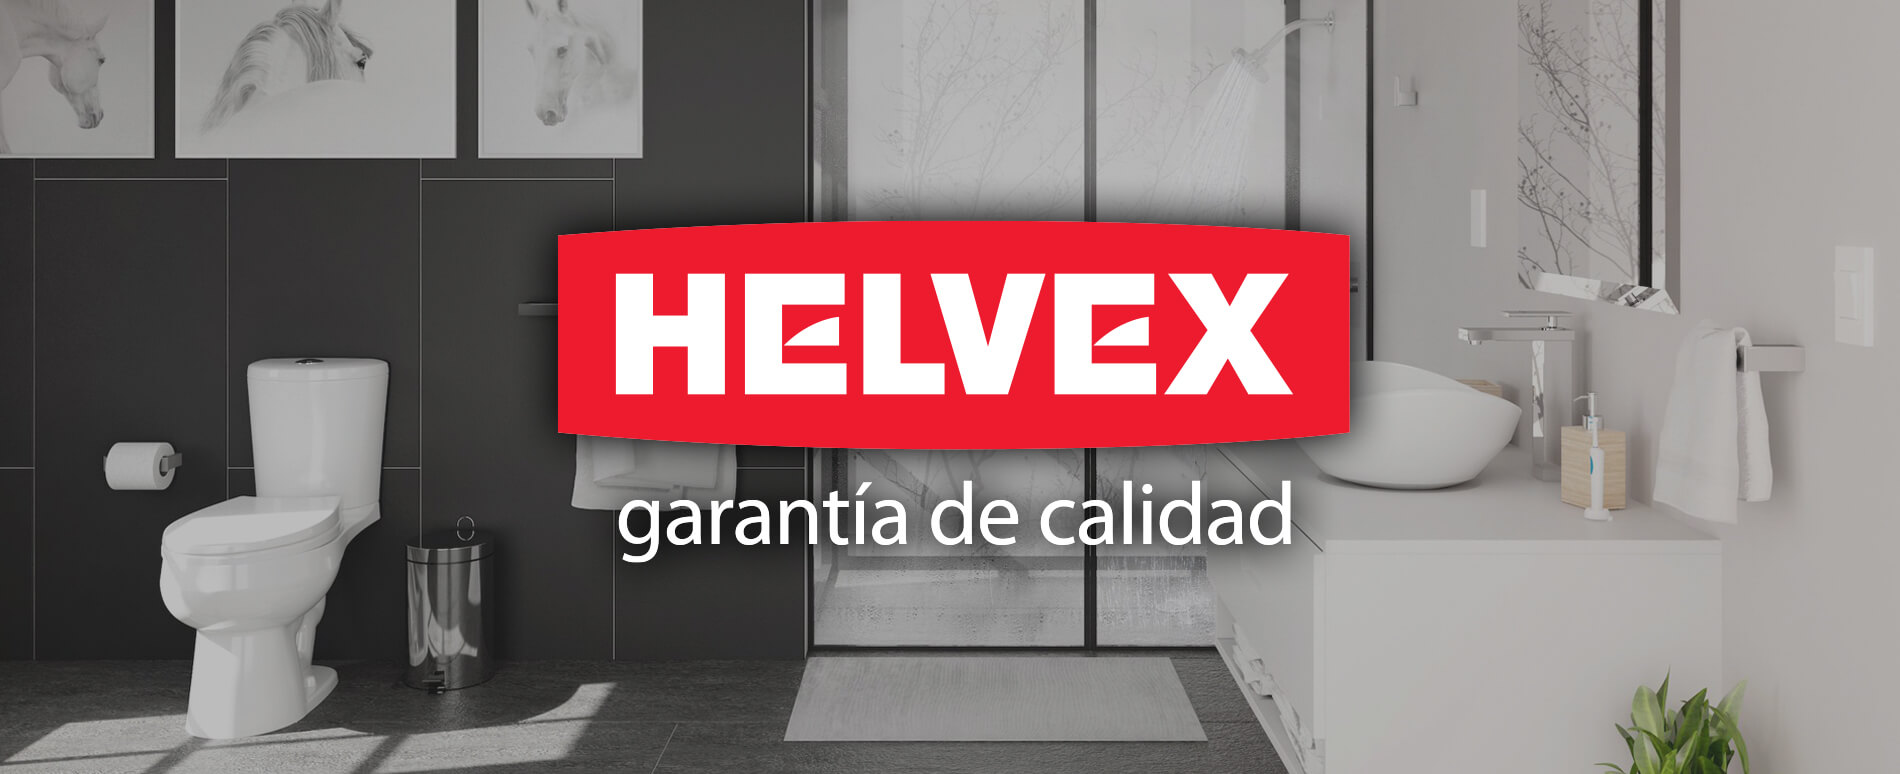 Helvex, empresa que aplica el método Kaizen